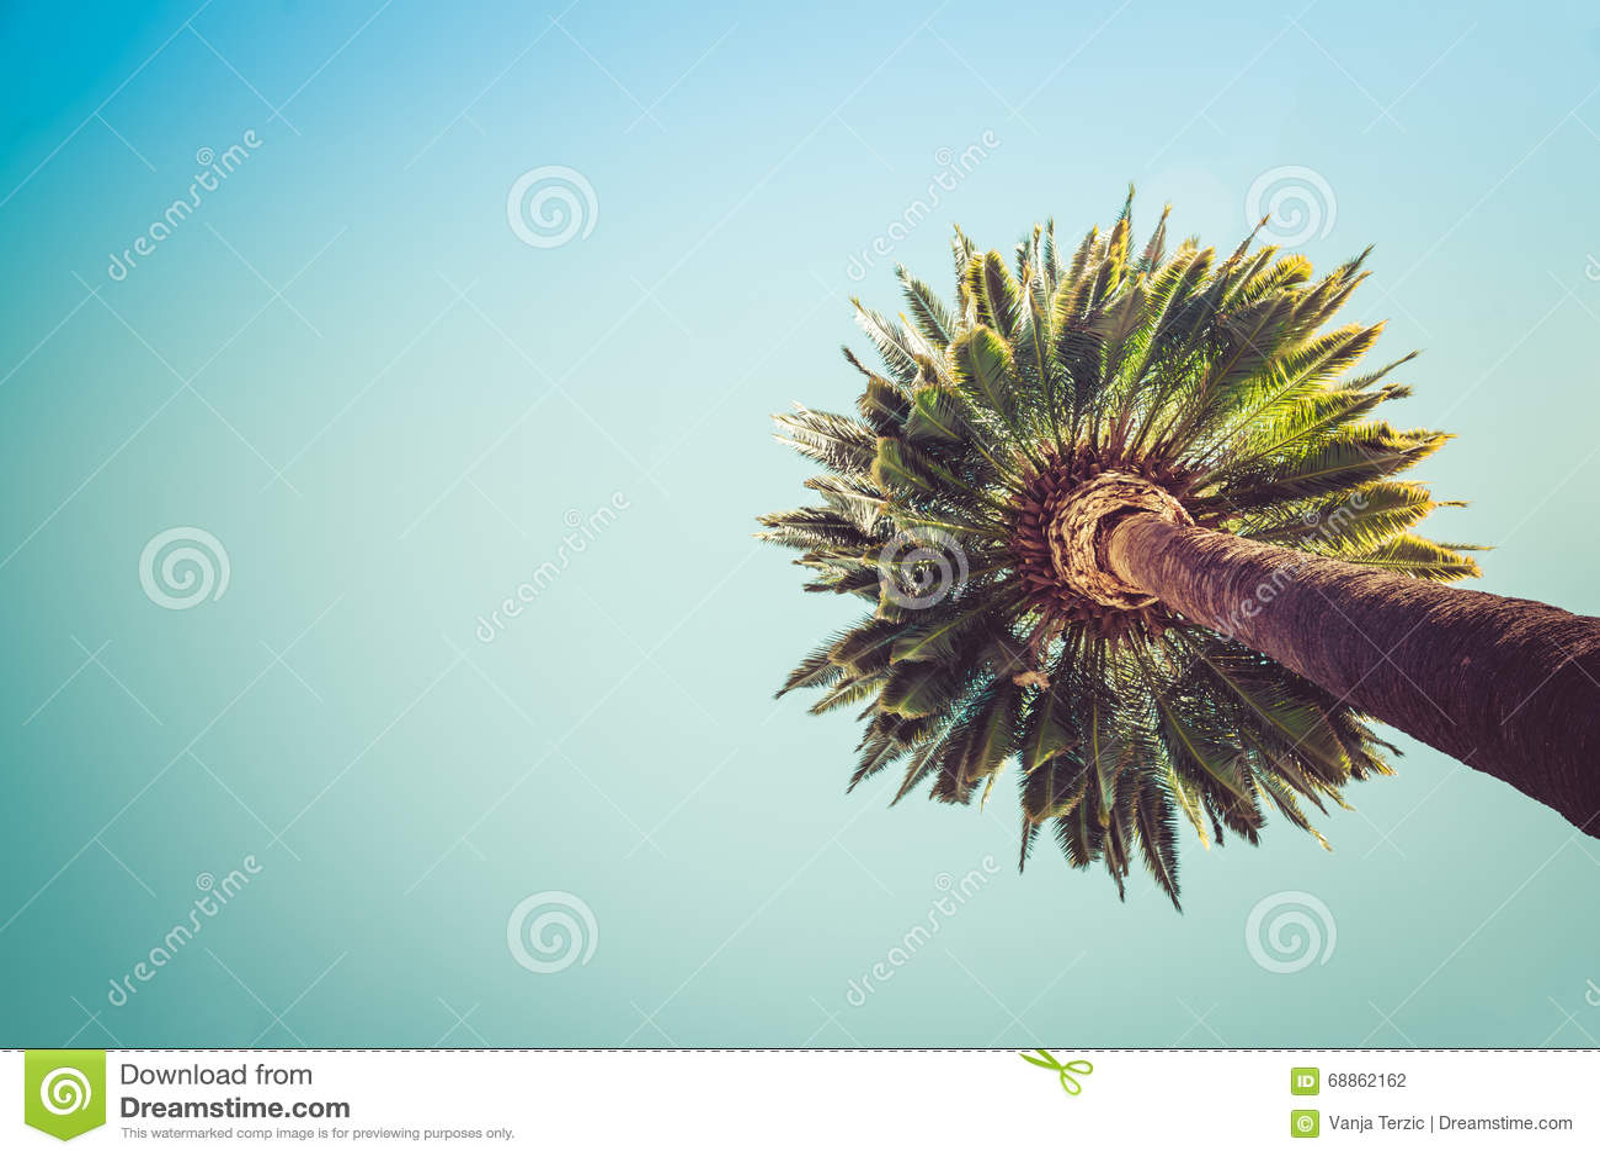 Beverly Hills Palms Trees Vintage